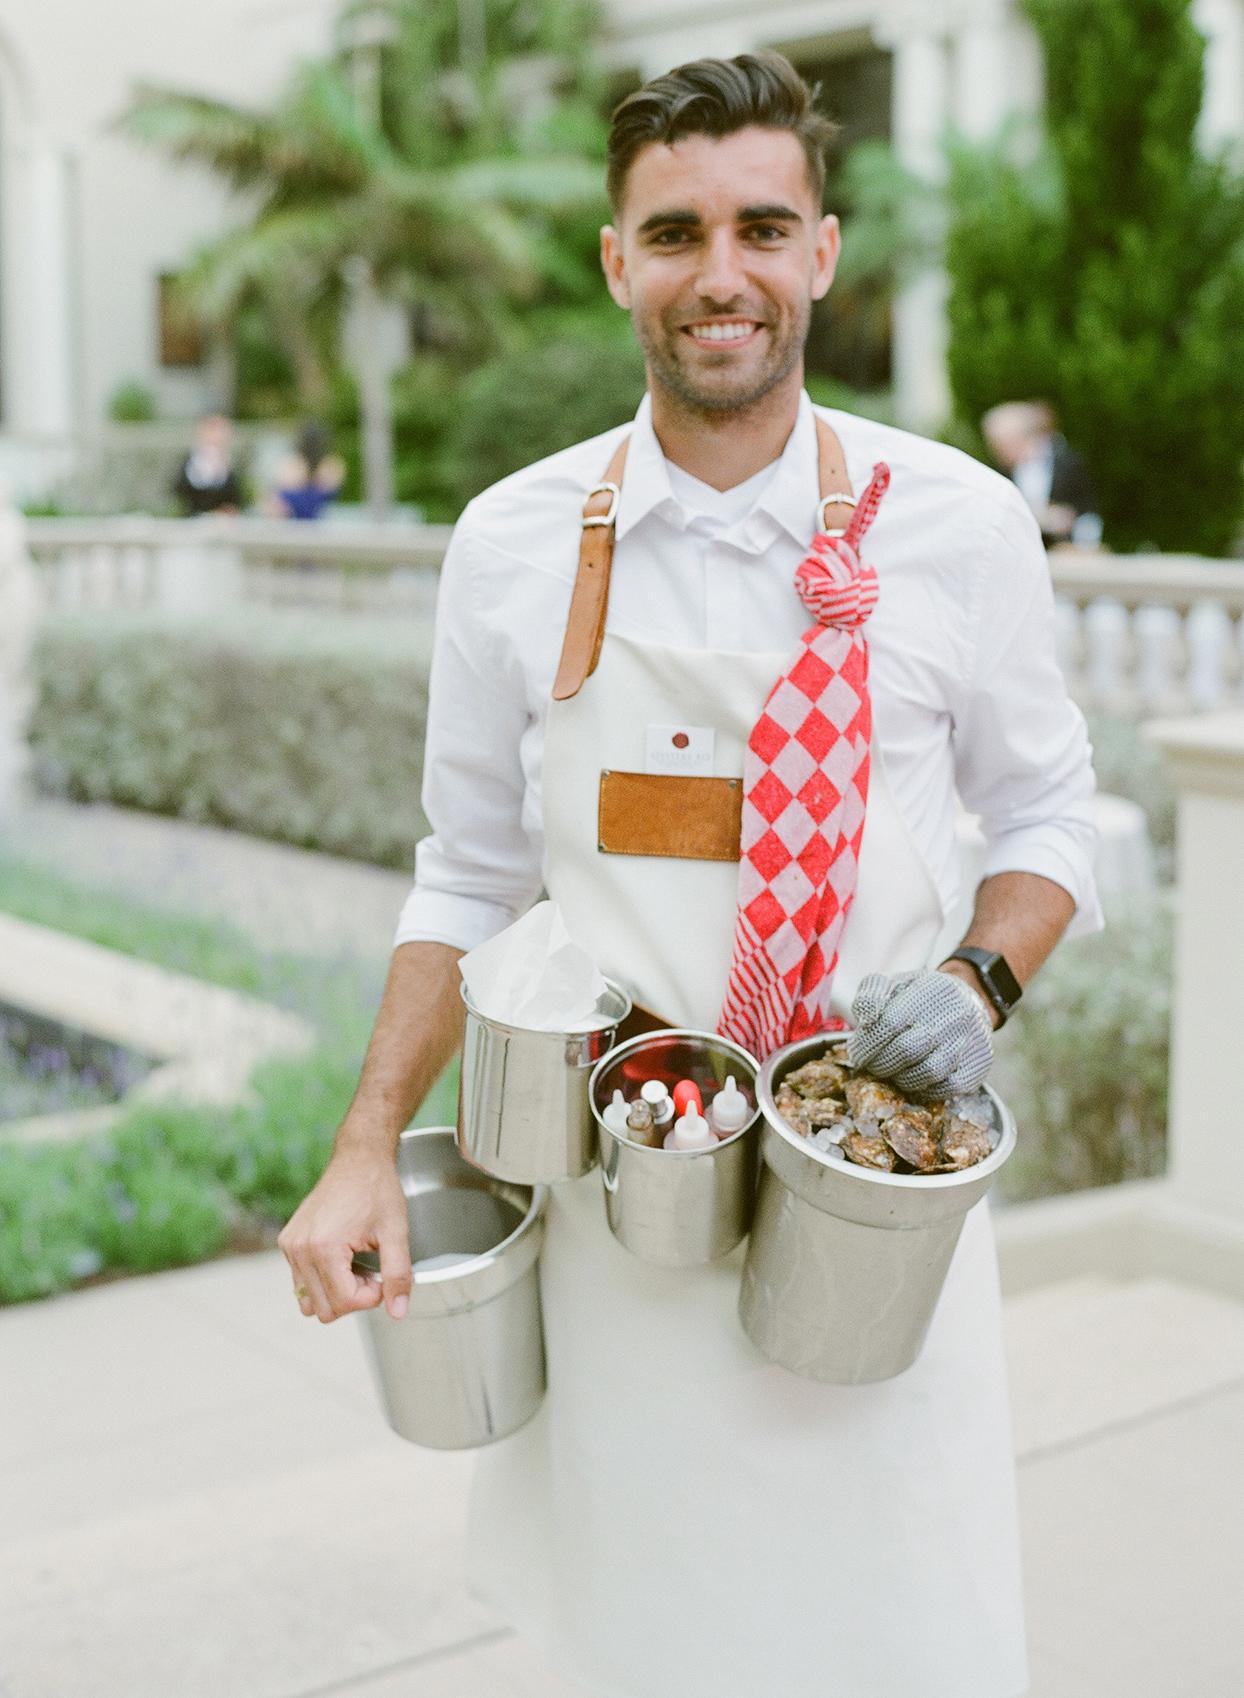 brittany brian wedding server wearing oyster buckets belt